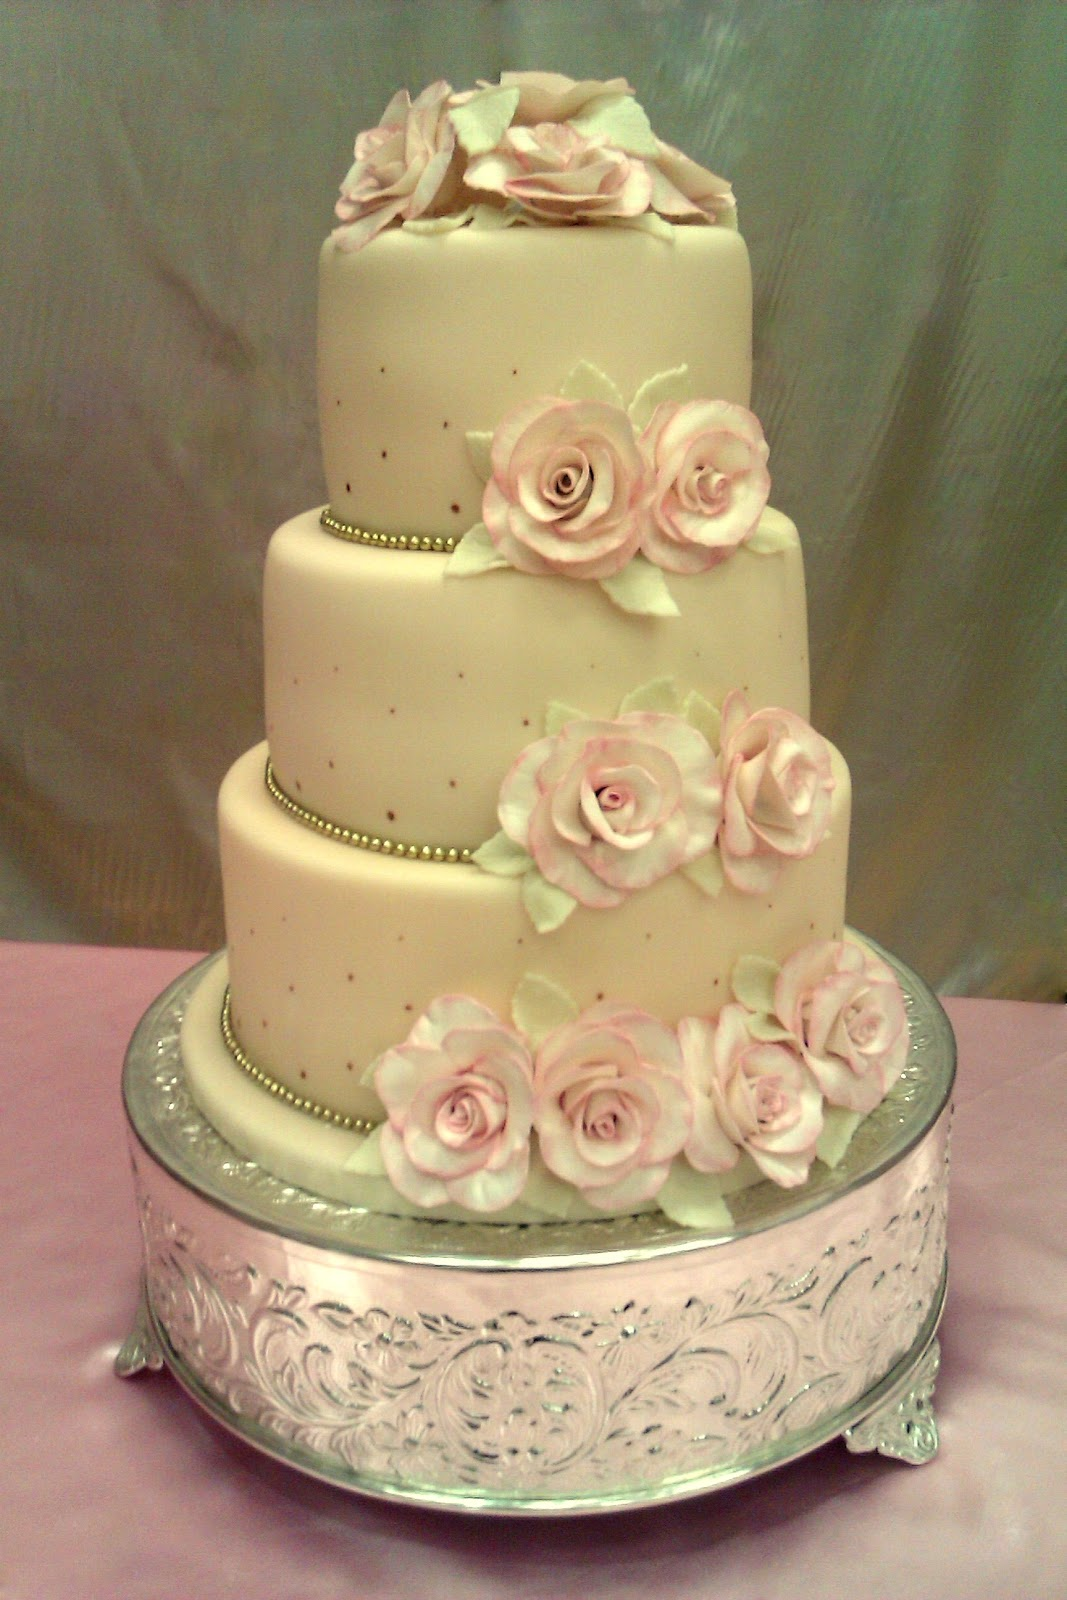 Custom Cakes By Stef: Vintage Rosette Wedding